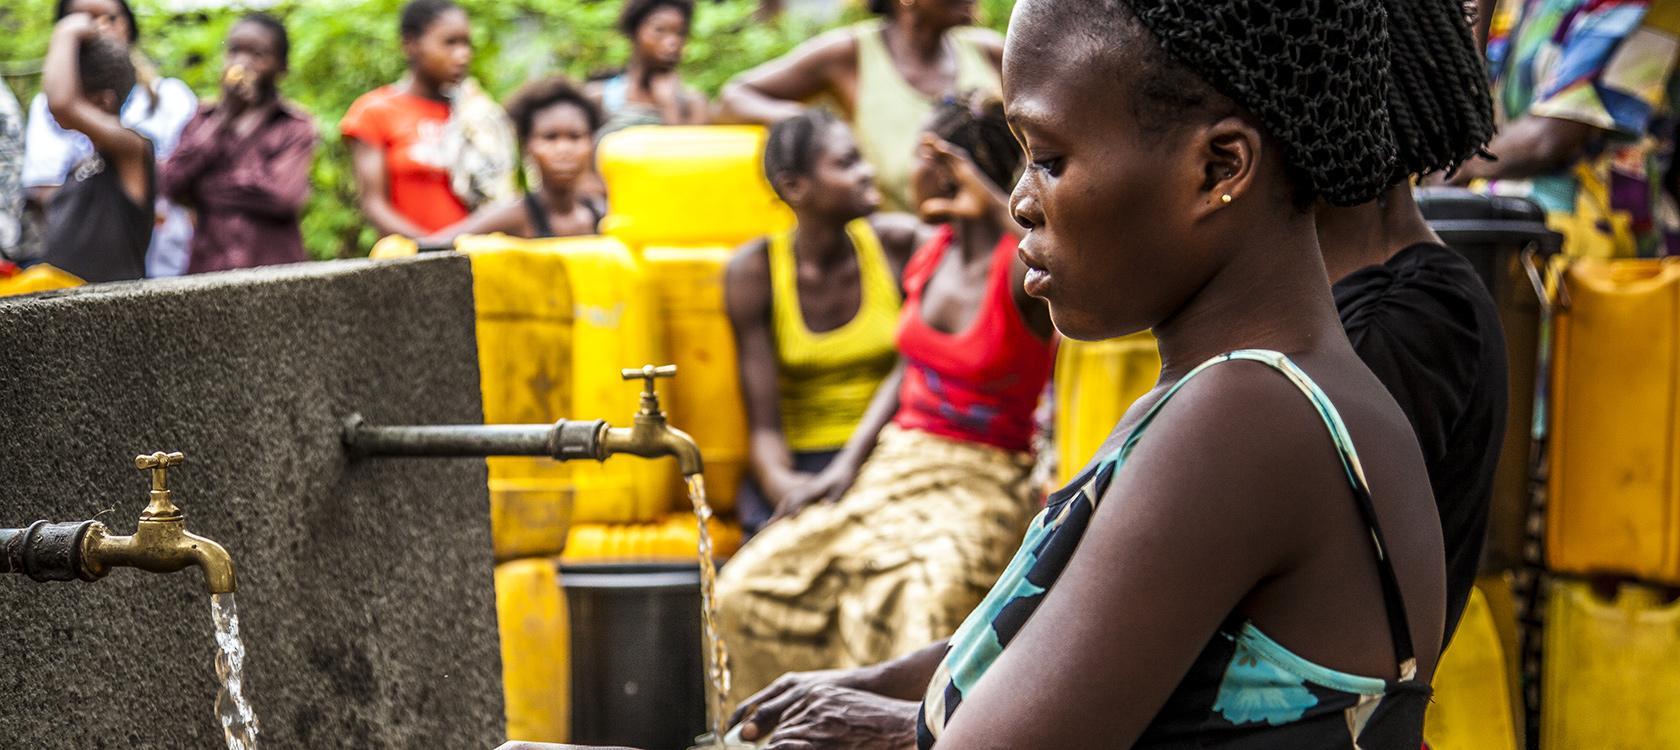 Africa, RDC, water